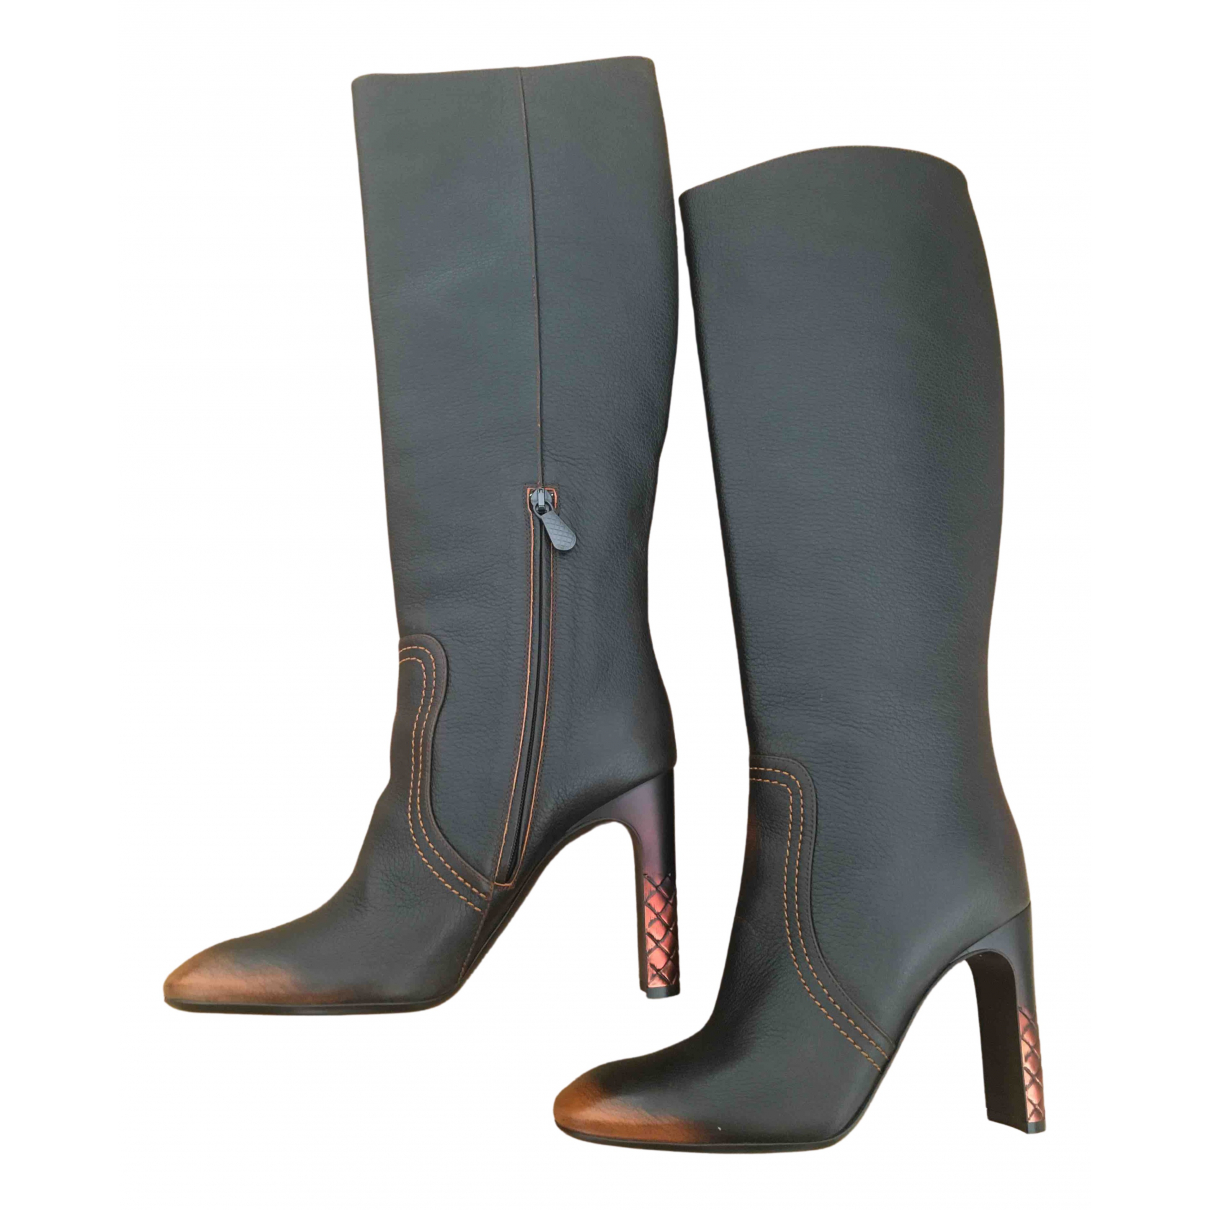 Bottega Veneta - Bottes   pour femme en cuir - marron